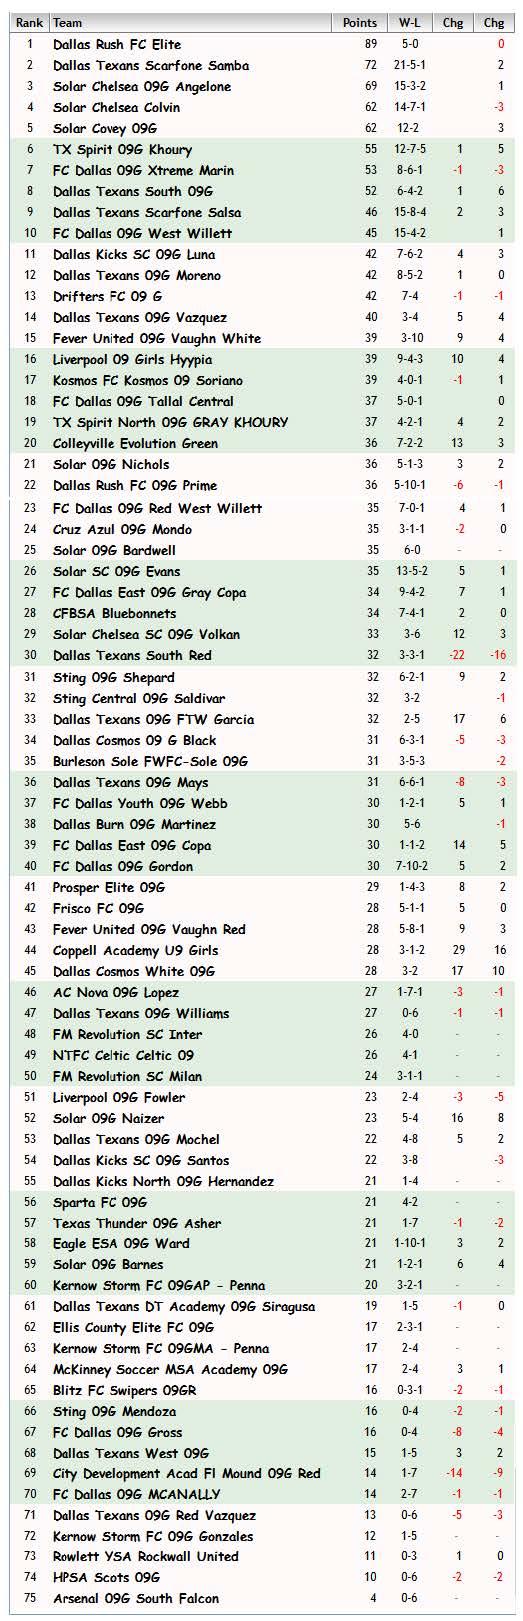 FBR09 Rankings October 17th, 2017 Fbr09_11